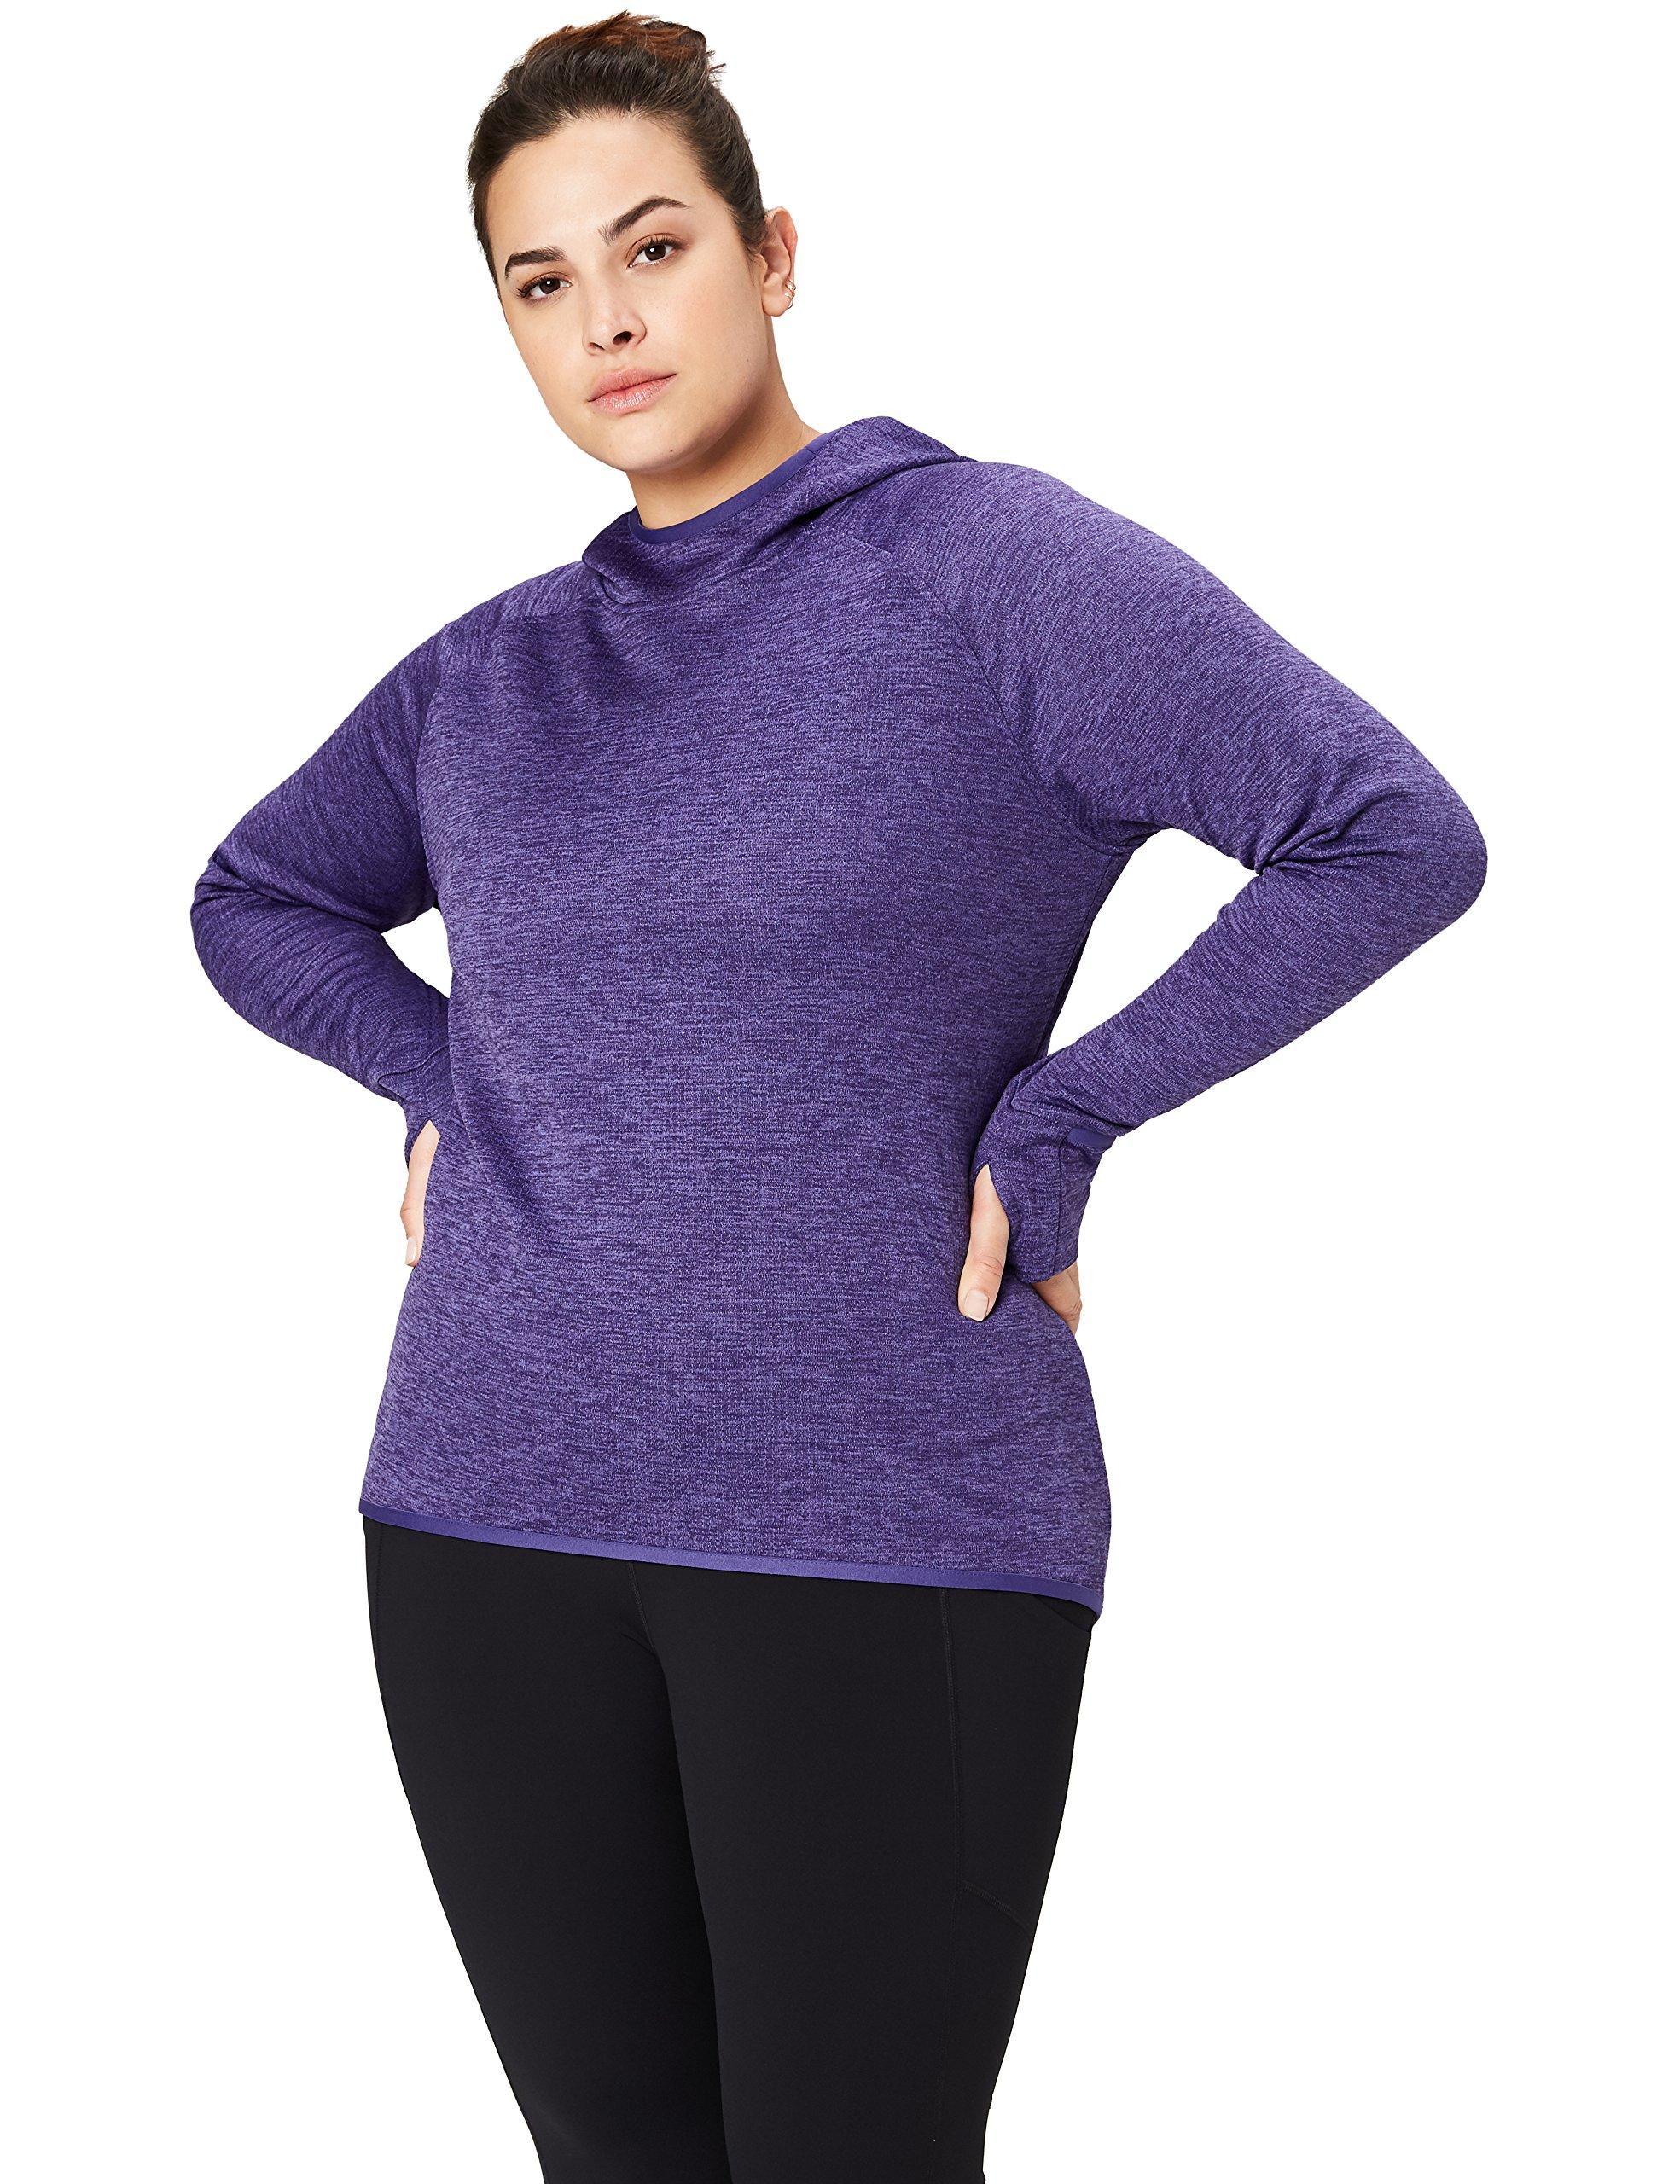 Core 10 Women's Plus Size Be Warm Thermal Fitted Run Hoodie (XS-XL, Plus Size 1X-3X), Grape Heather, 1X (14W-16W)